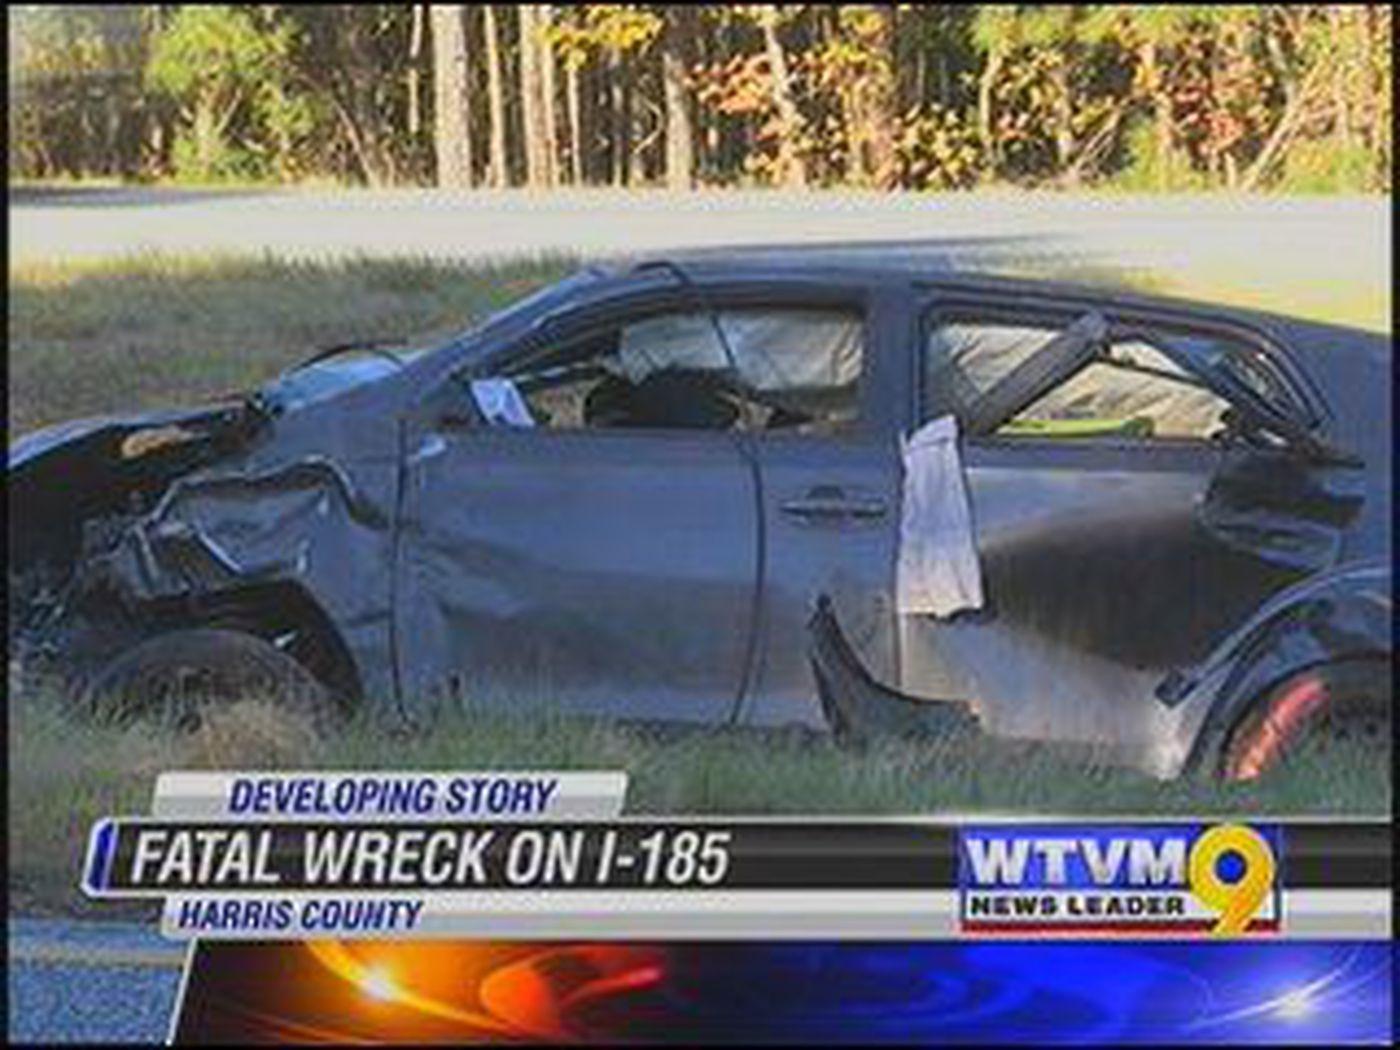 One killed, 4 injured in single-car crash on I-185 in Harris County